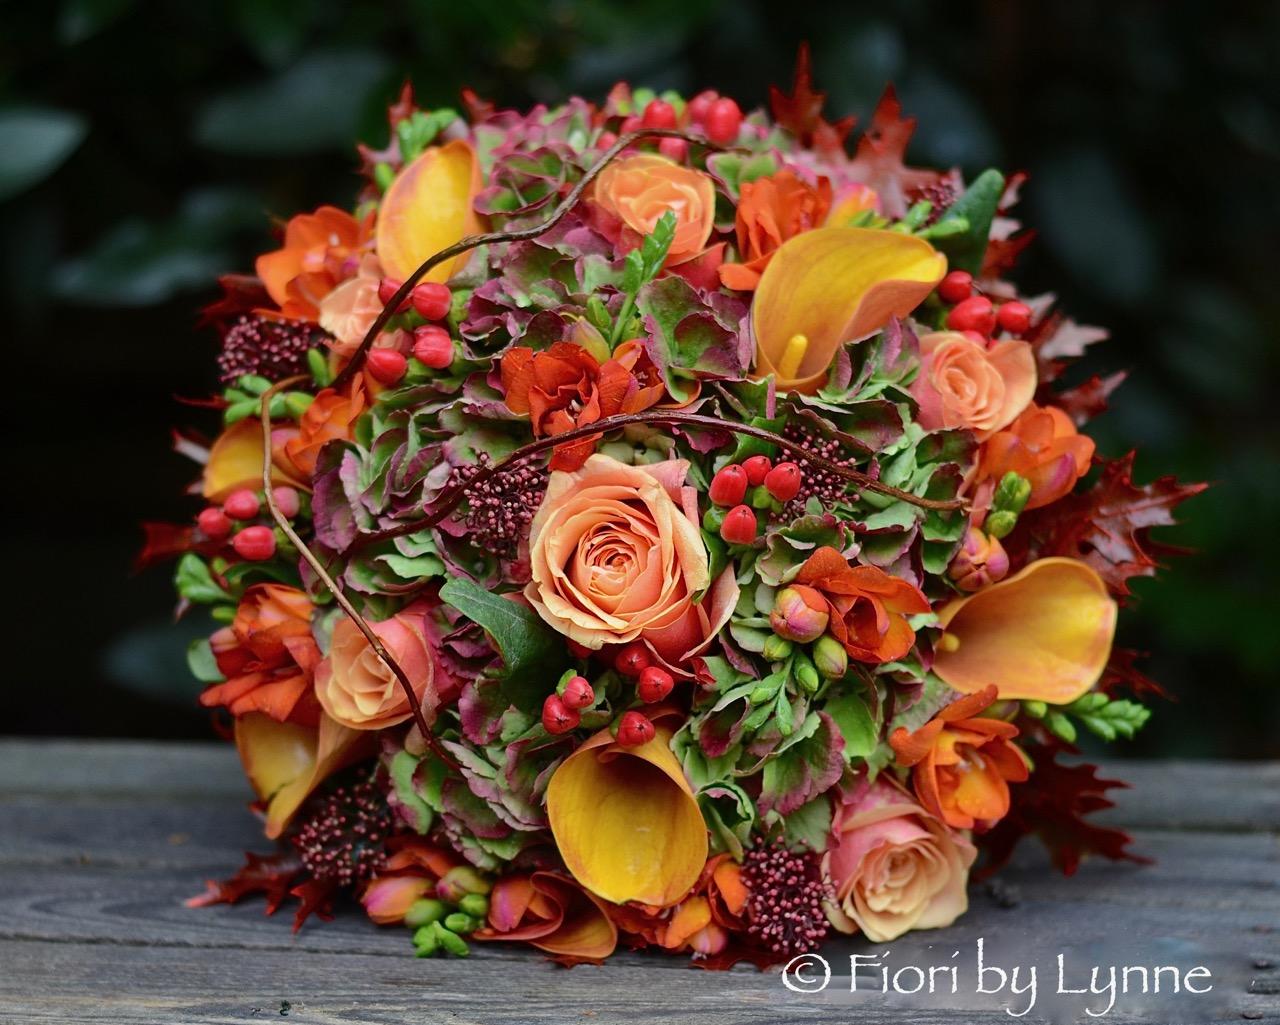 Ashleys Autumnal Wedding Flowers Rhinefield House